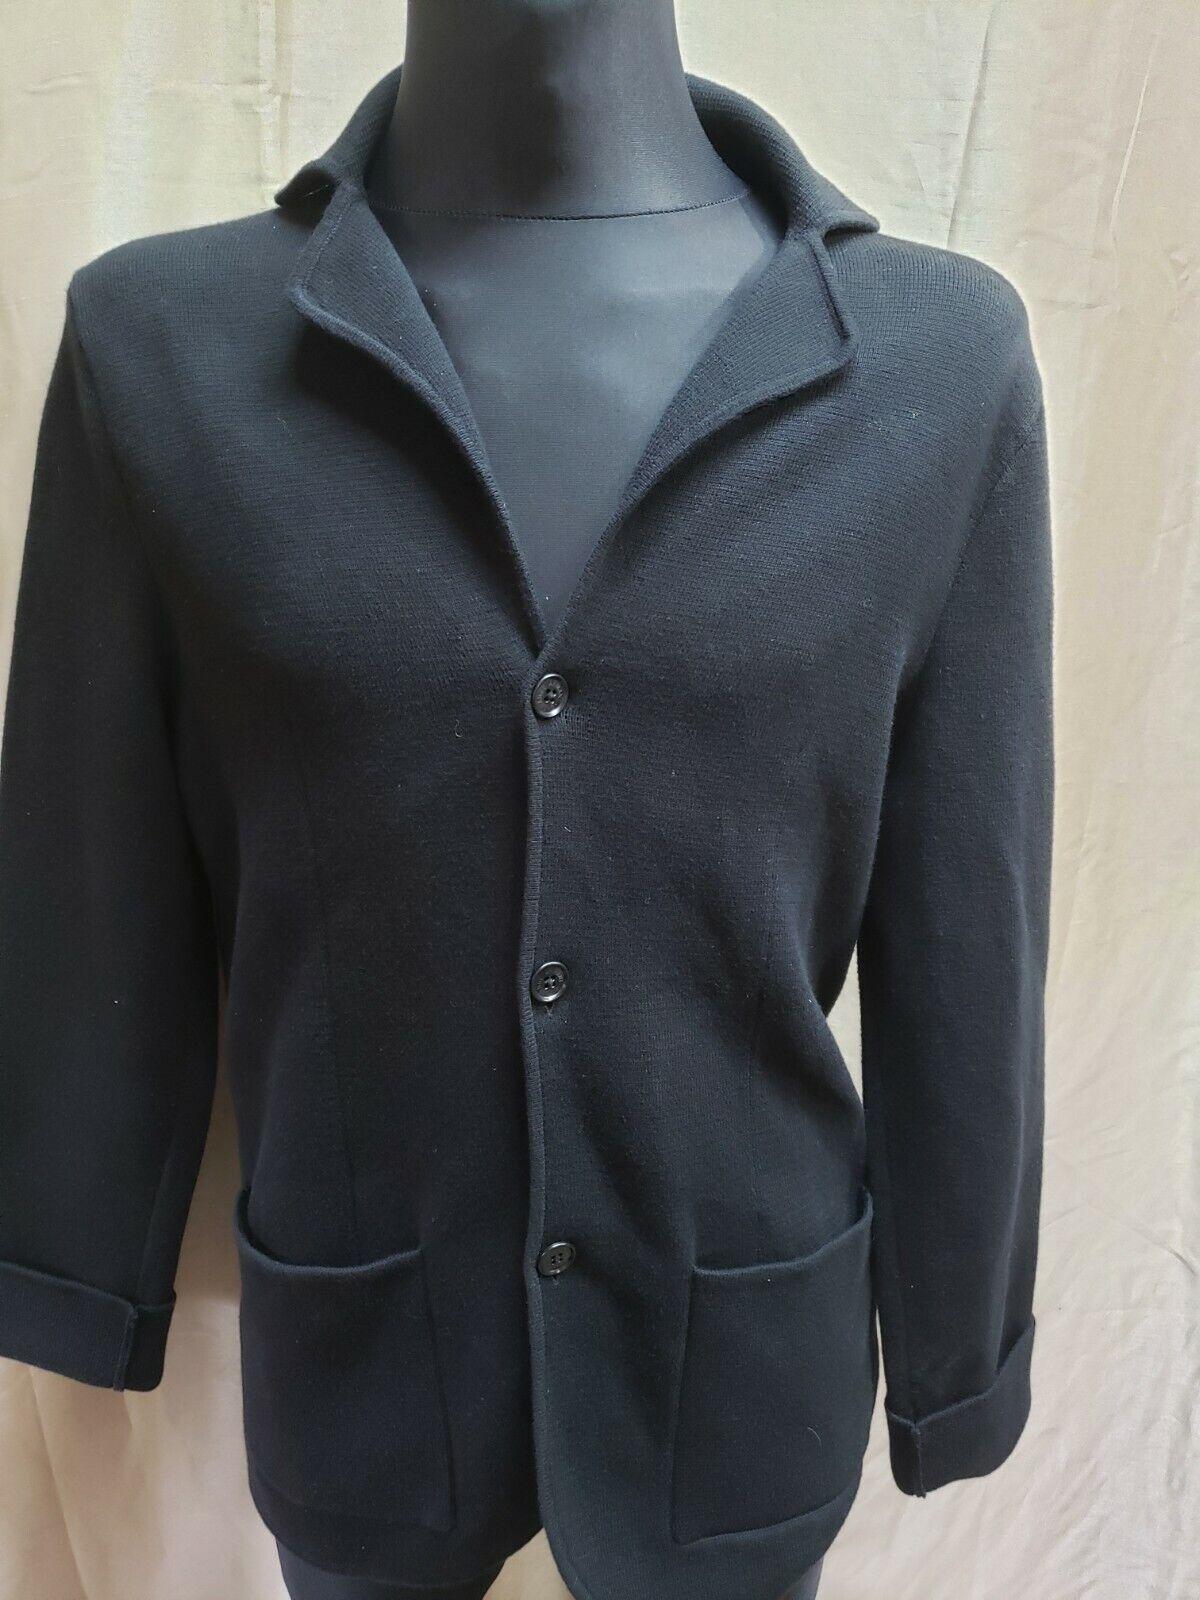 Armani Exchange A|X Mens Cardigan Blazer Rib Buttoned Sweater Jacket M.